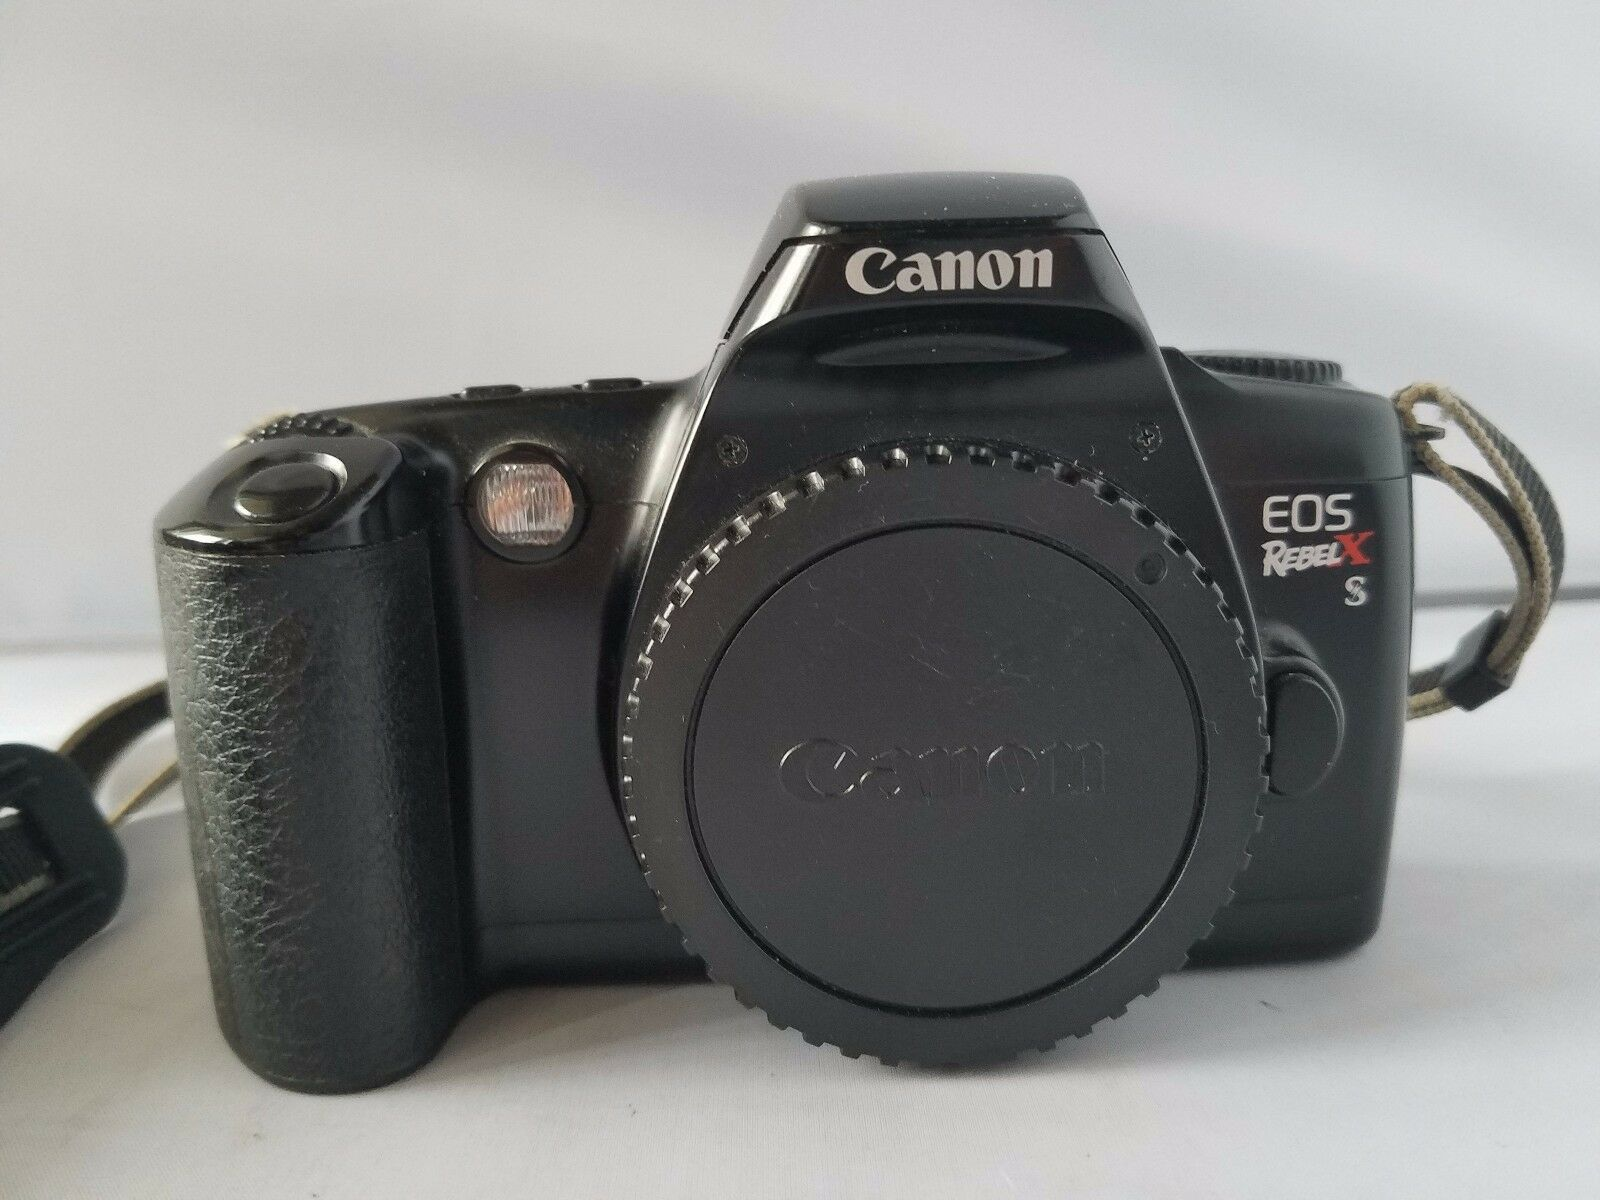 Canon EOS Rebel XS SLR Camera Bundle Accessories Carry Case Quantaray Flash